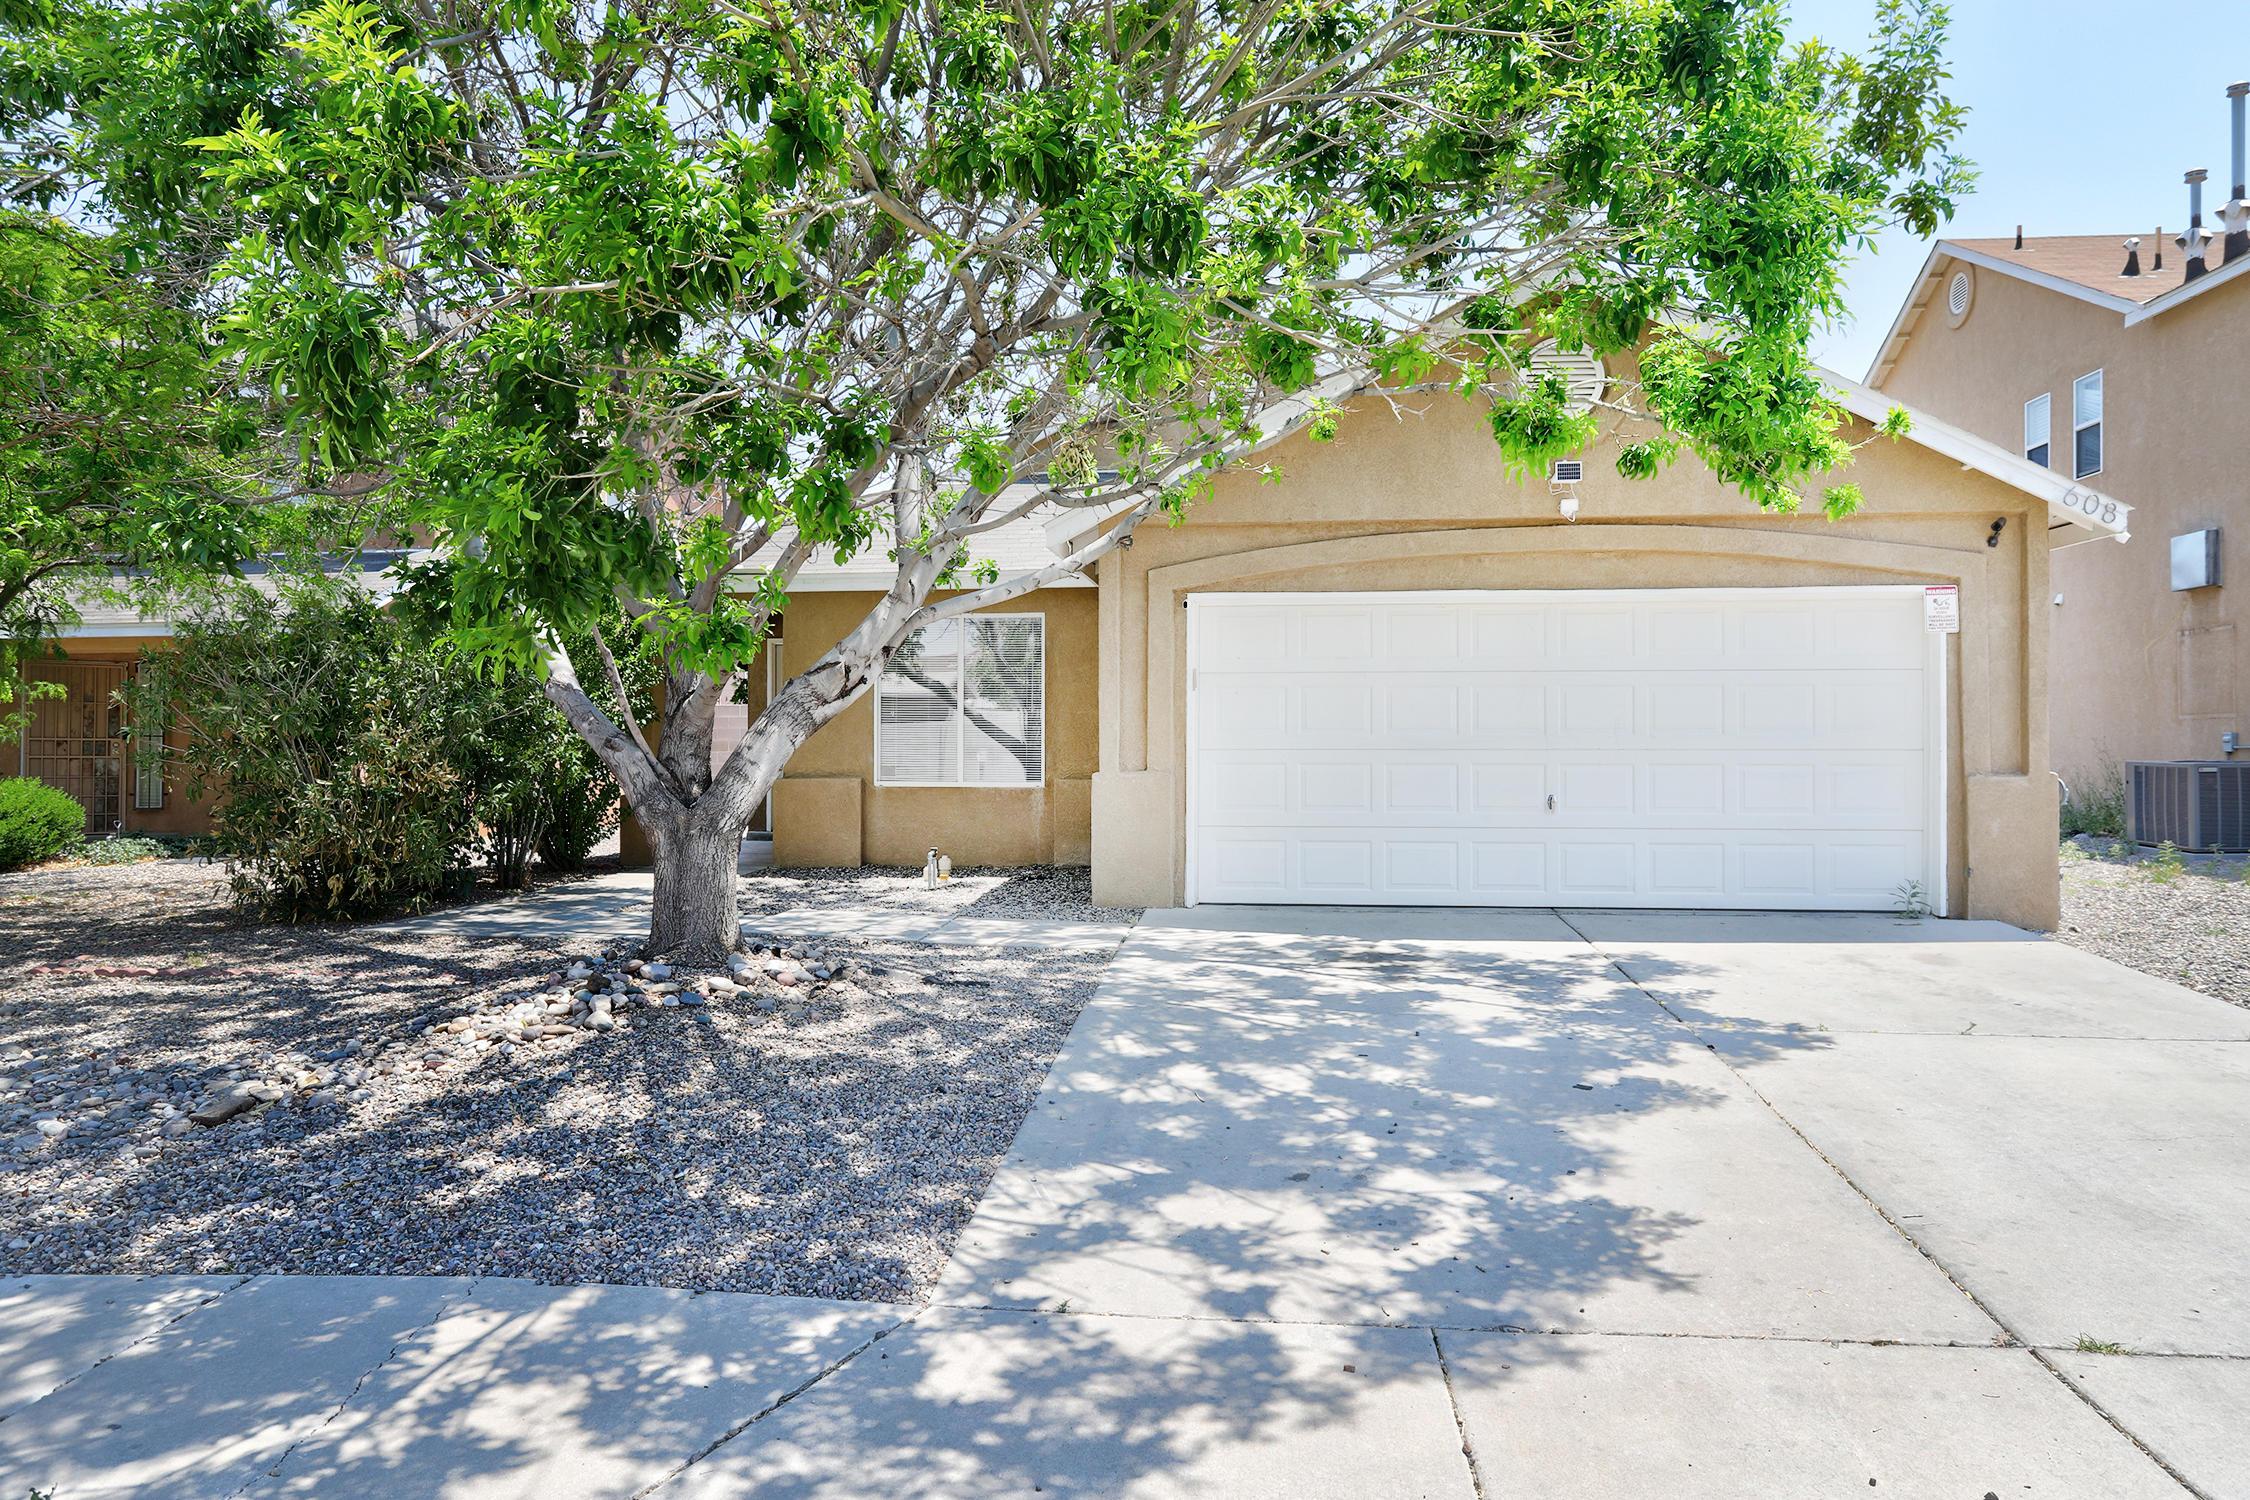 608 LONE PINE Drive, Albuquerque NM 87121